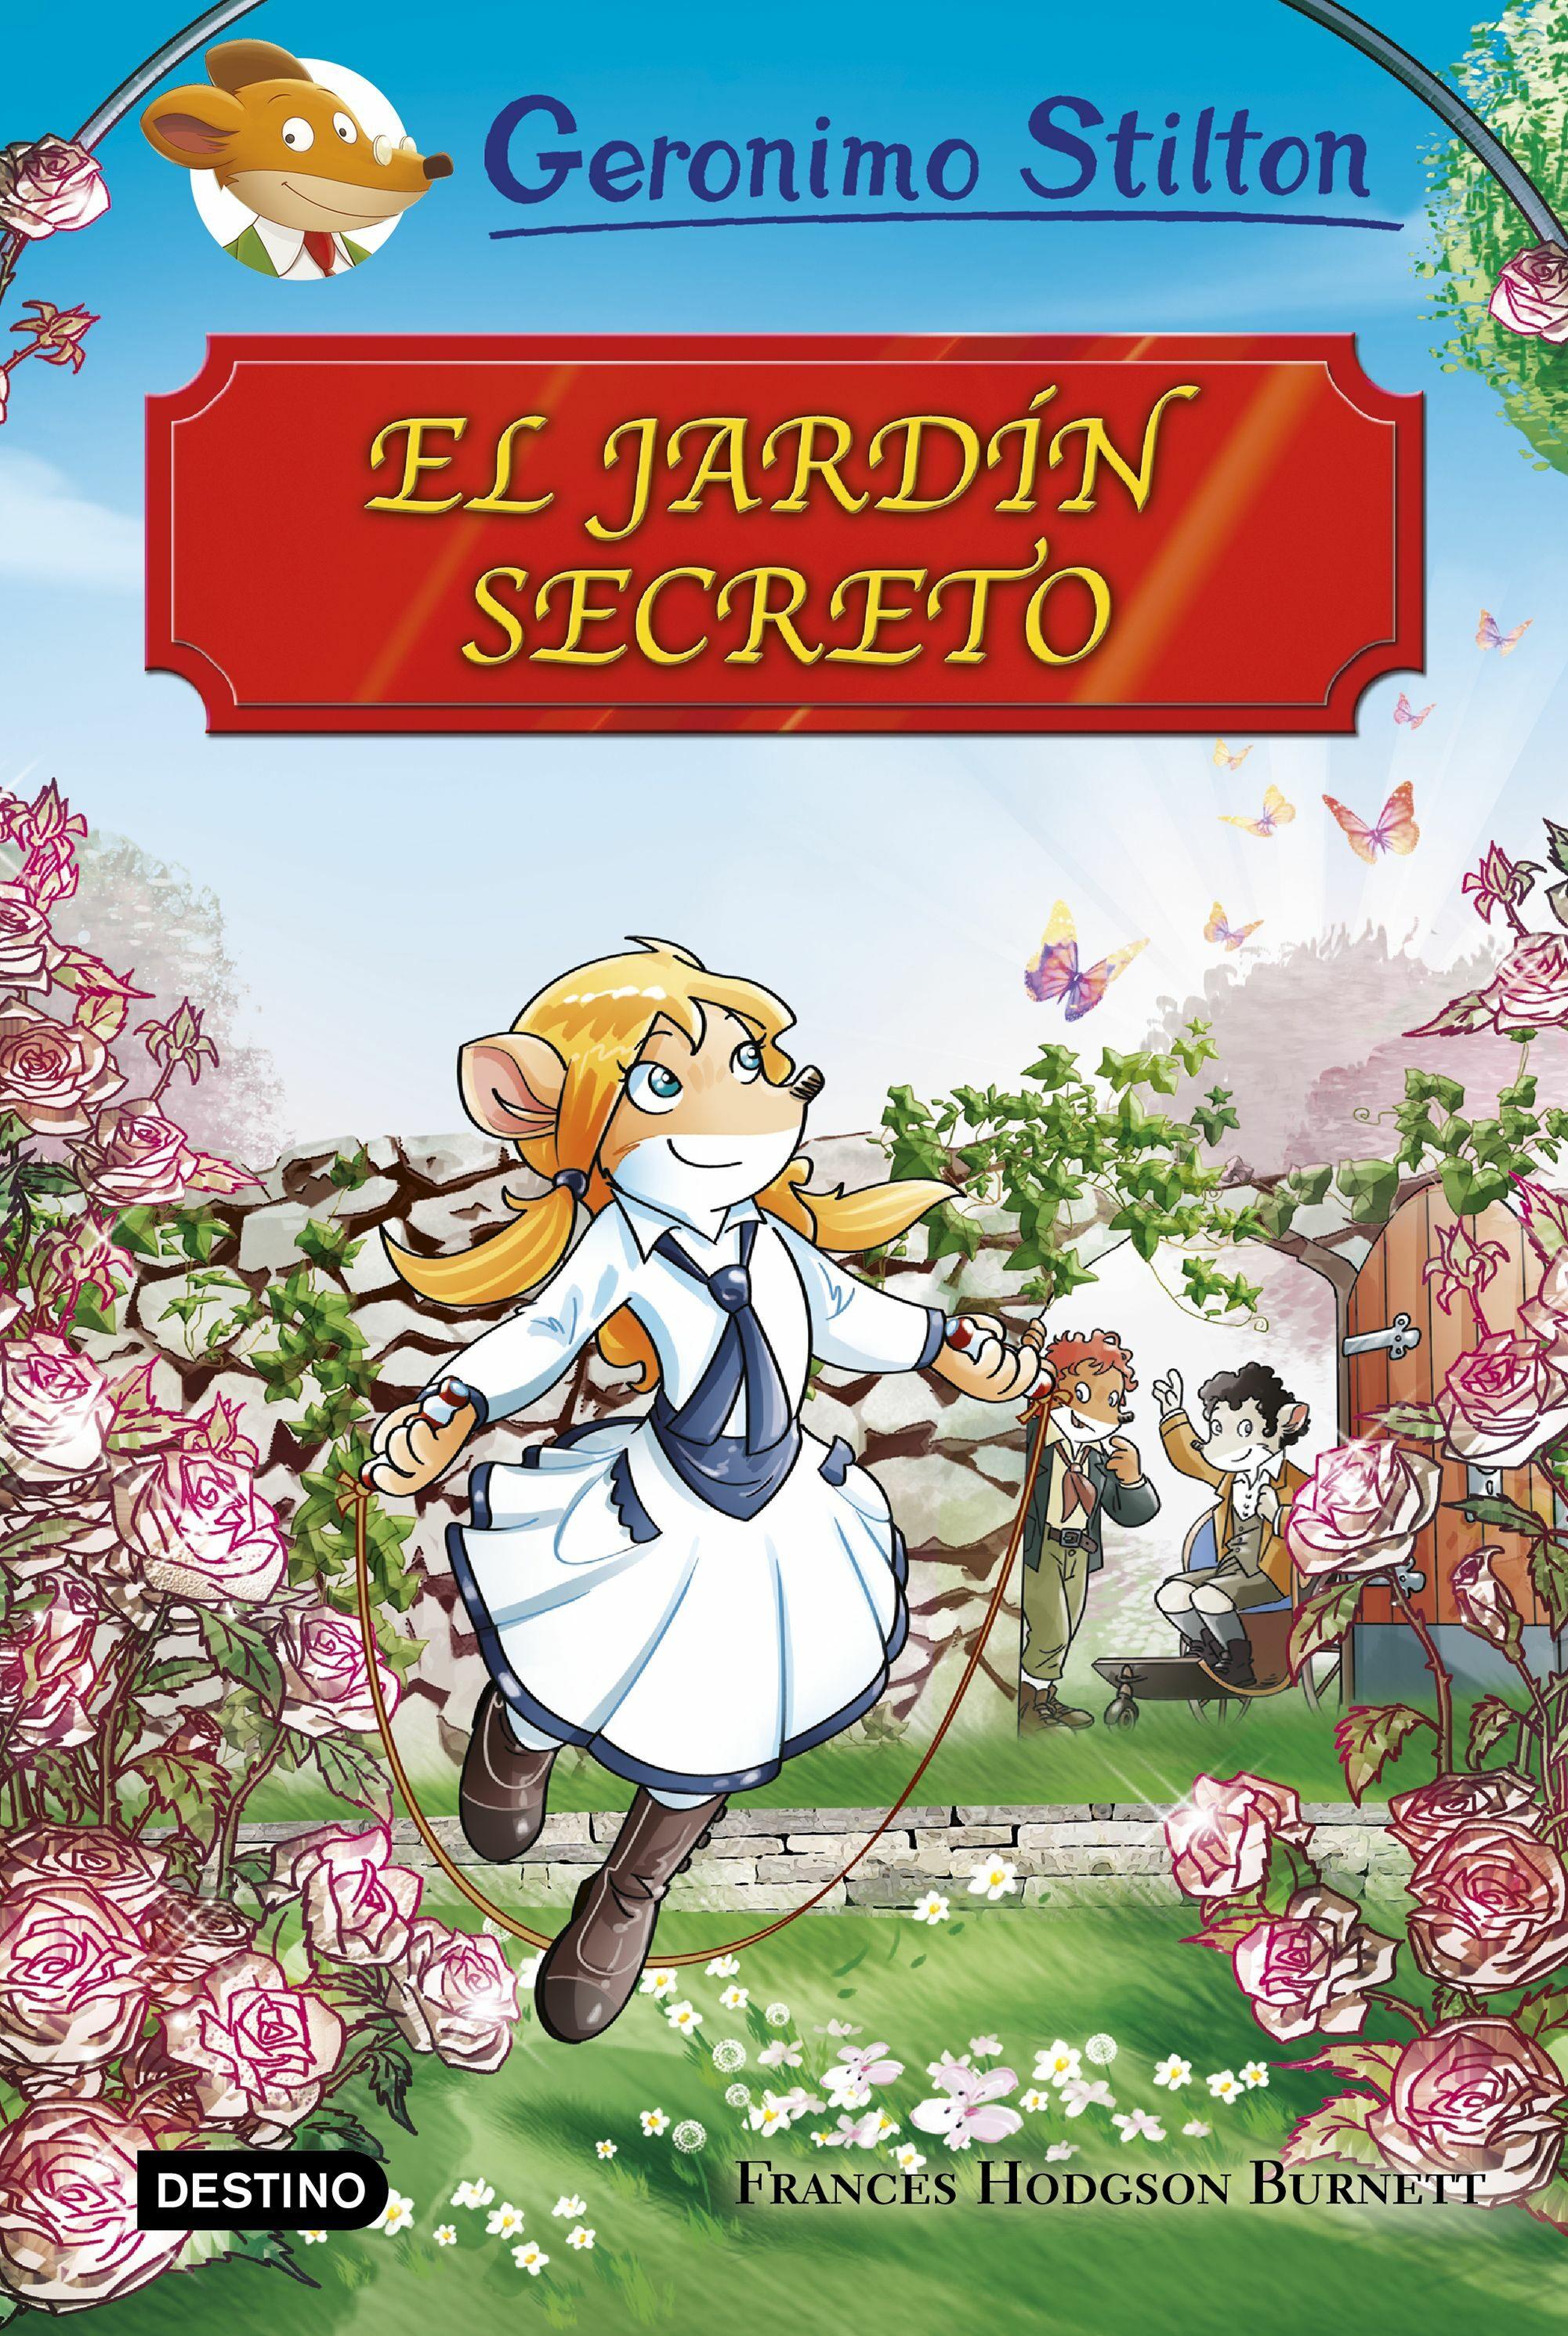 Grandes Historias El Jardin Secreto Geronimo Stilton Comprar